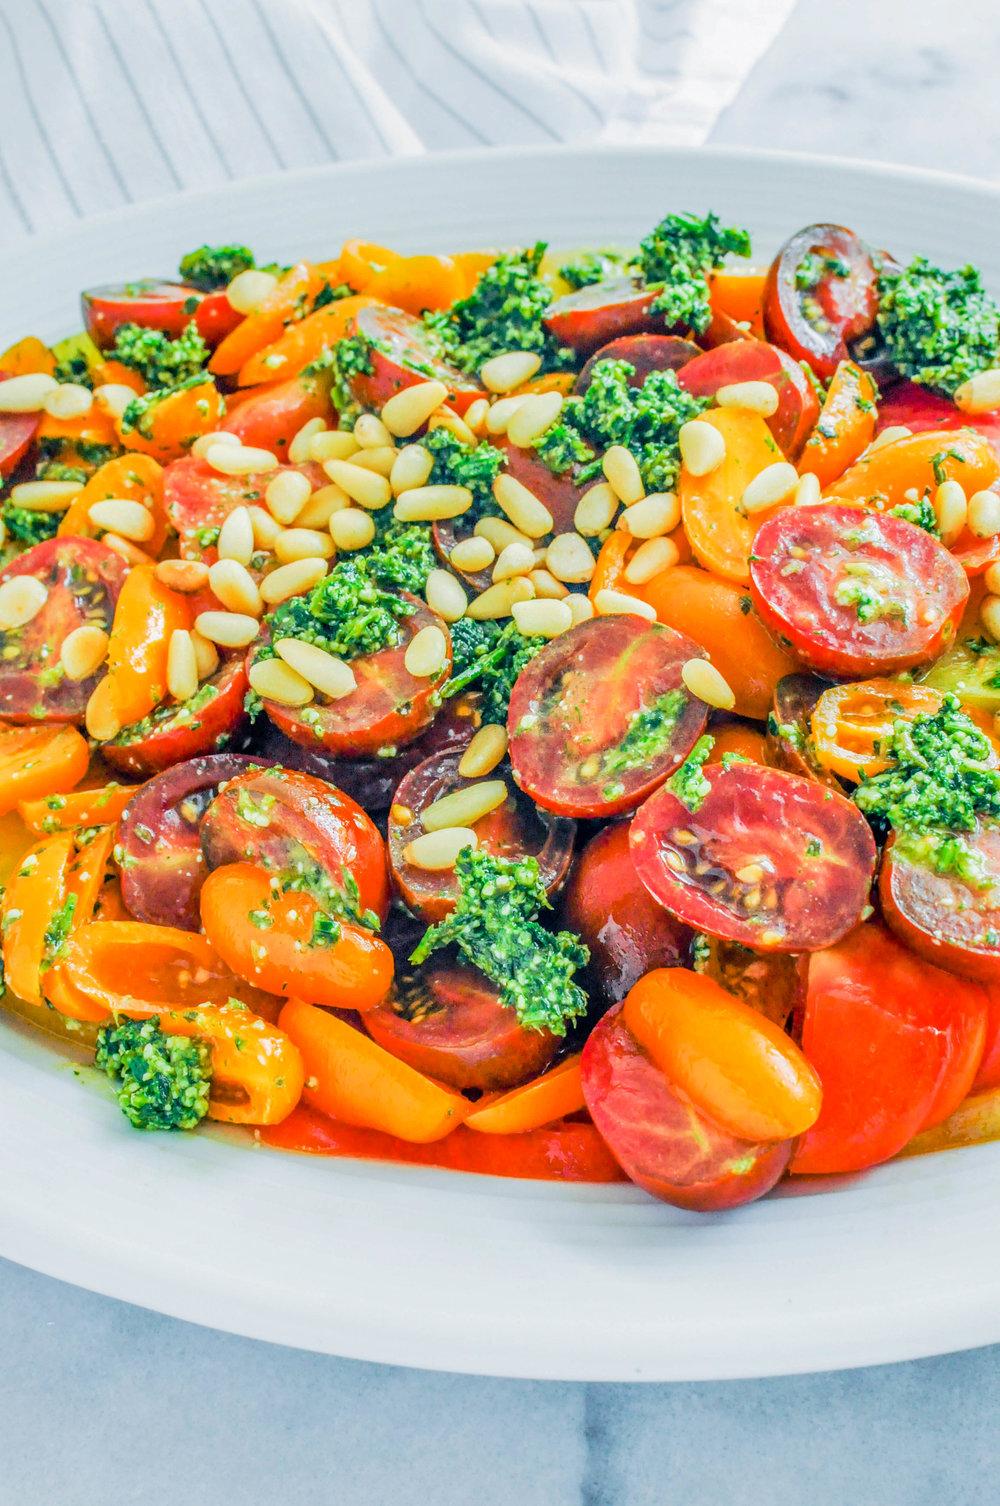 Easy Tomato Salad with Tarragon Pesto | This Healthy Table